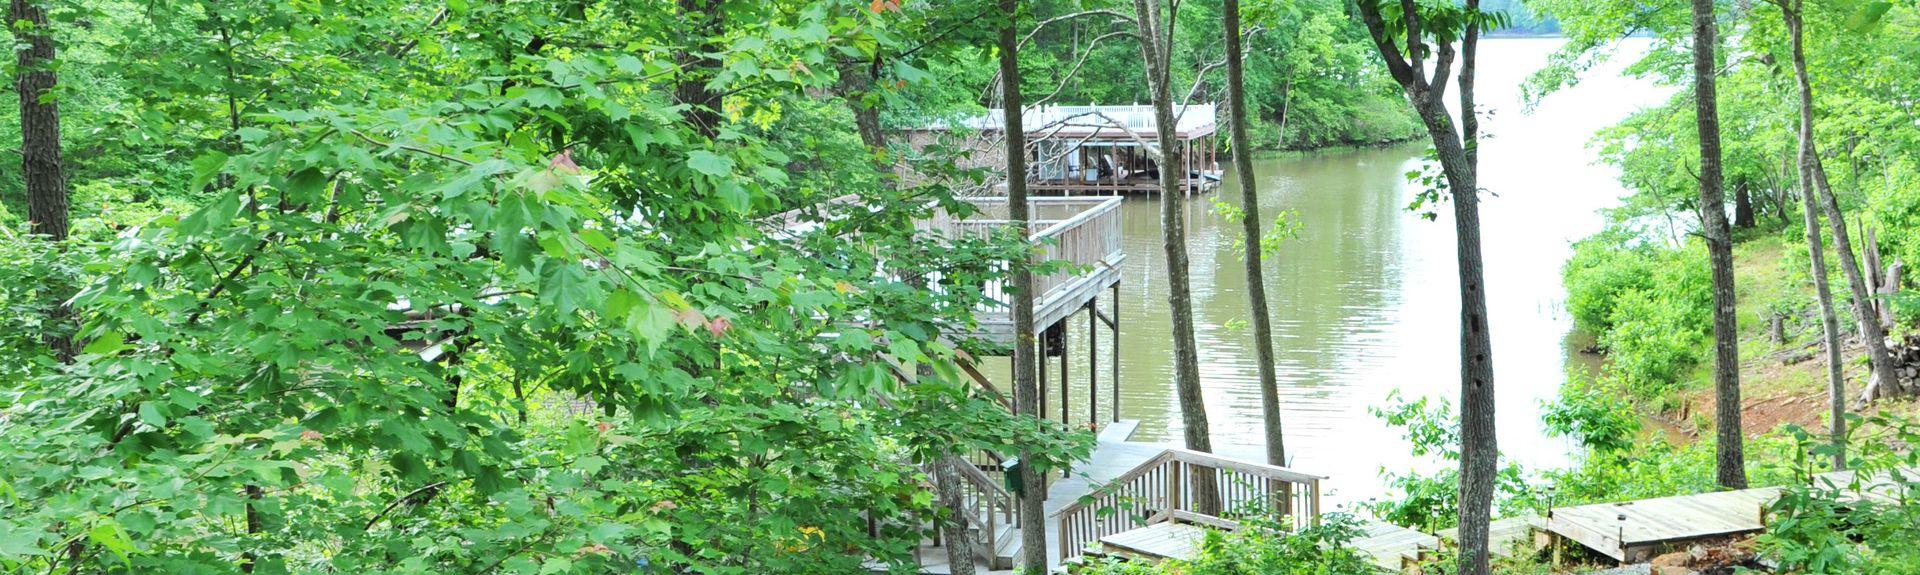 Kerr Lake Country Club, Henderson, North Carolina, United States